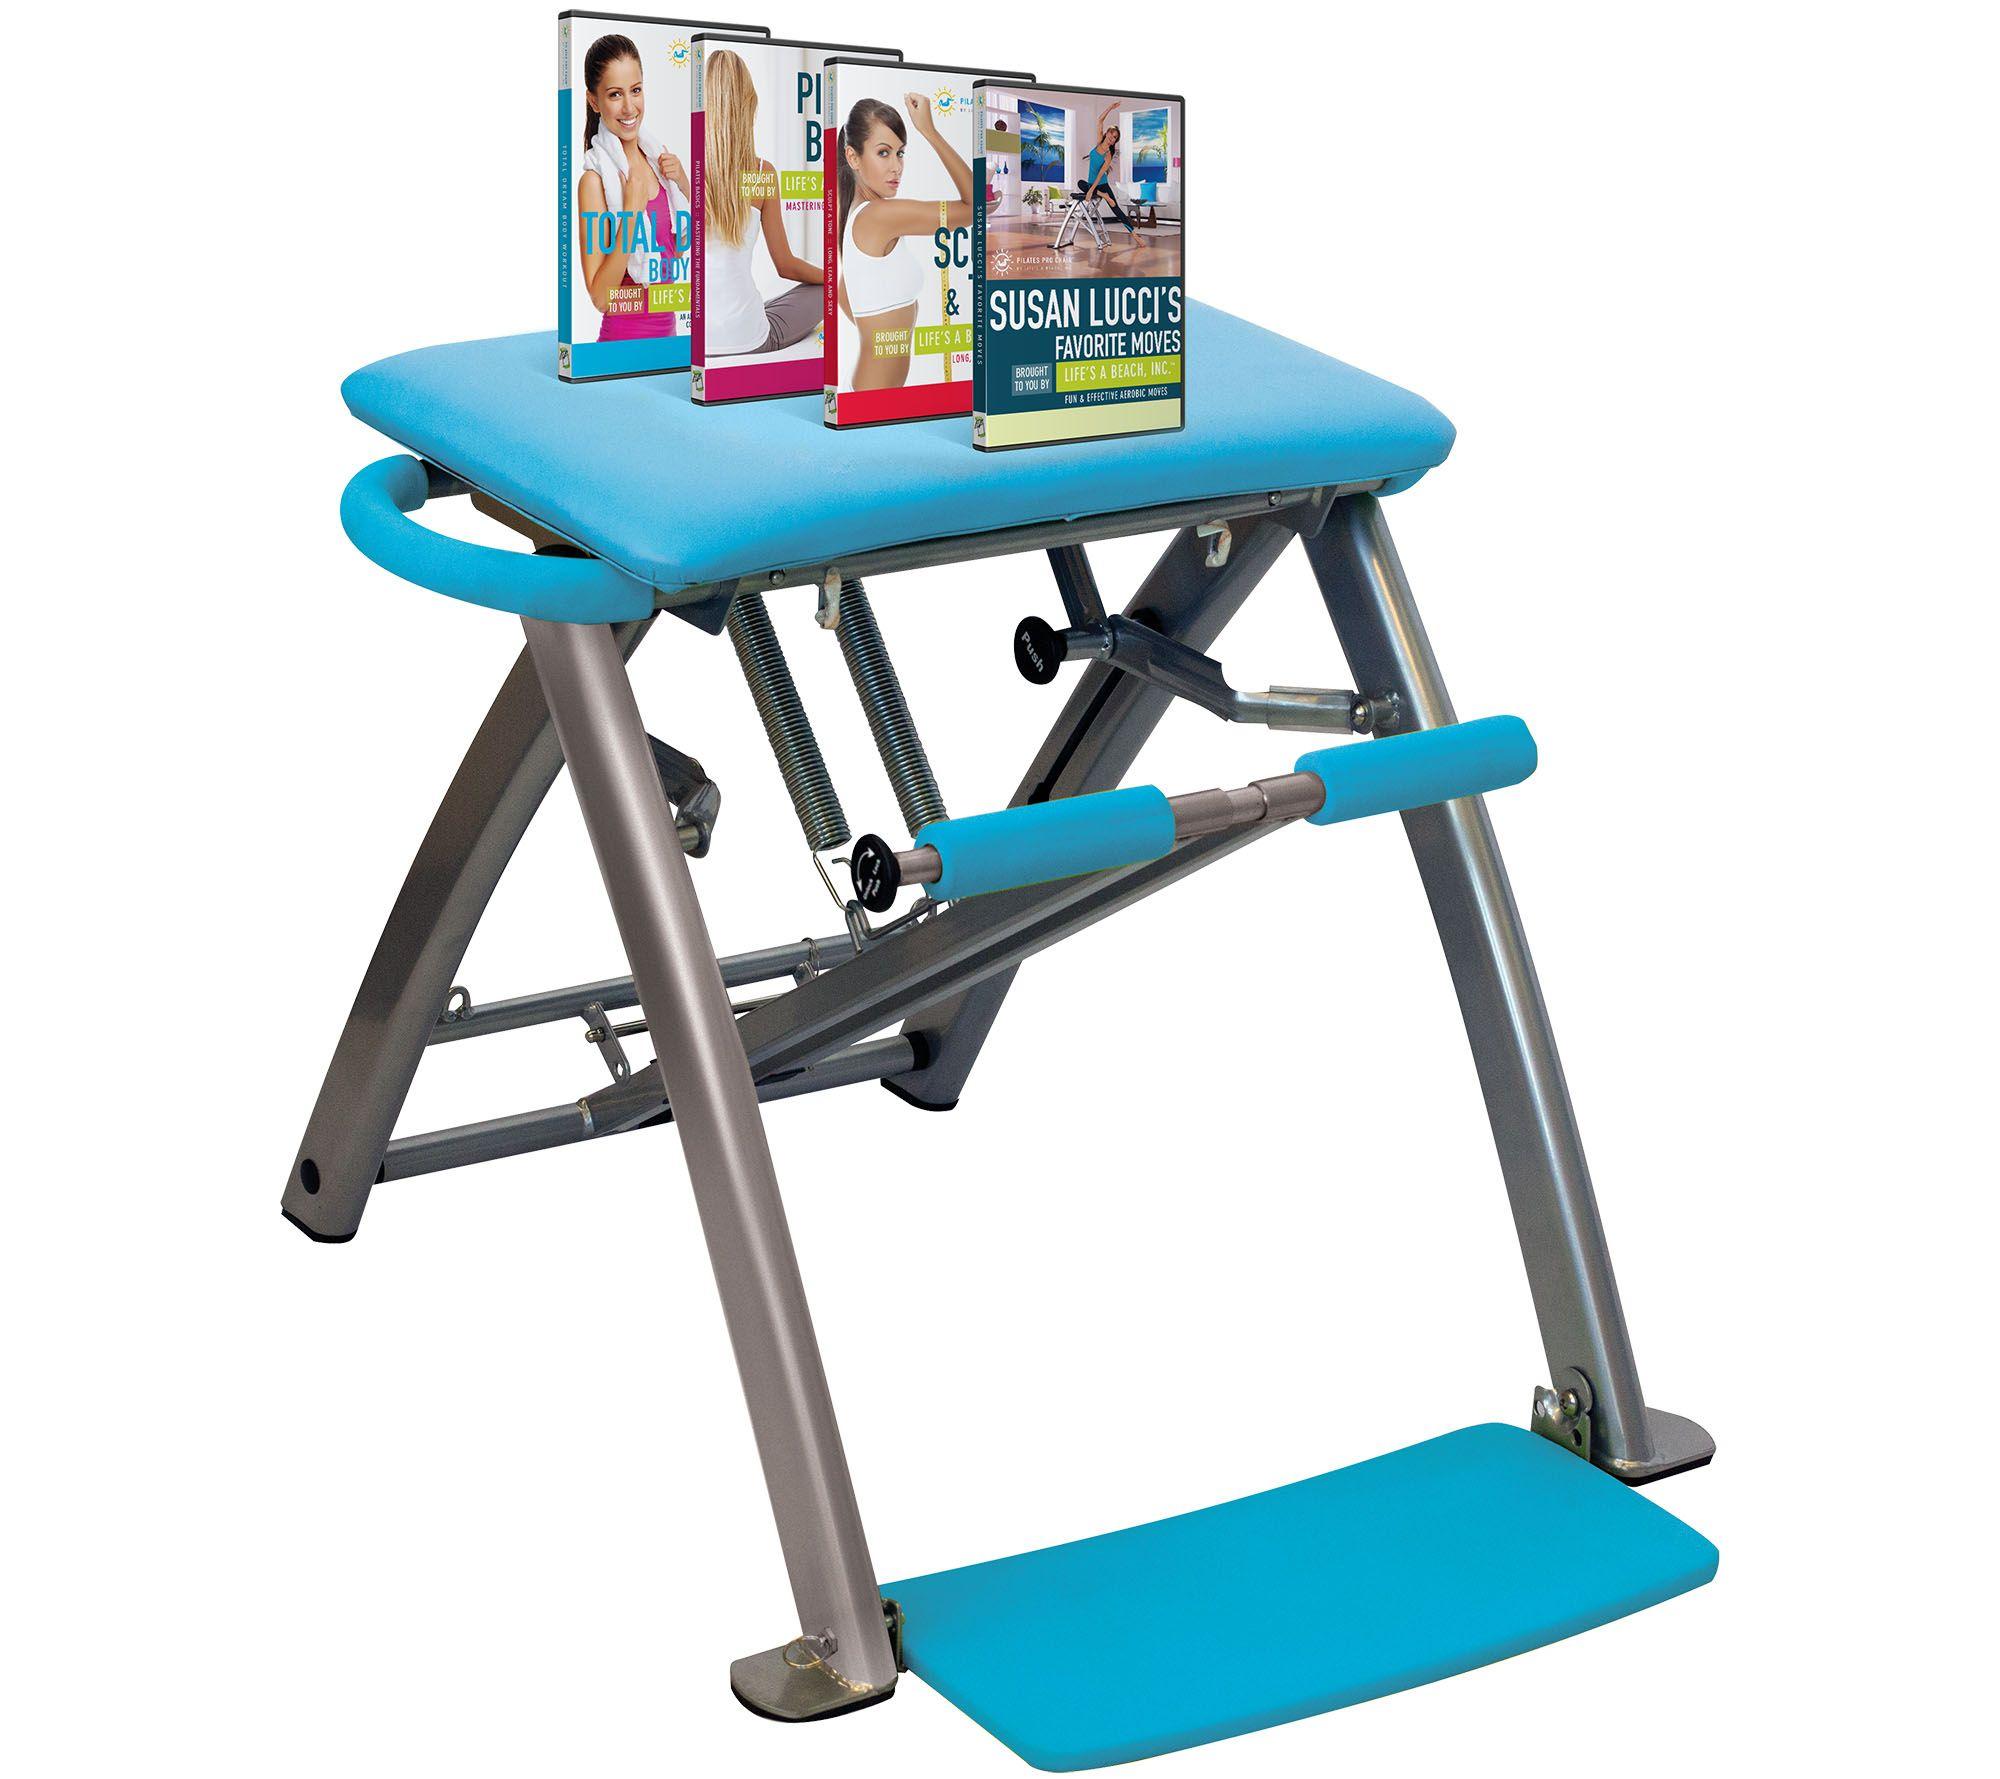 Pilates Chair Dvds Lifes Beach